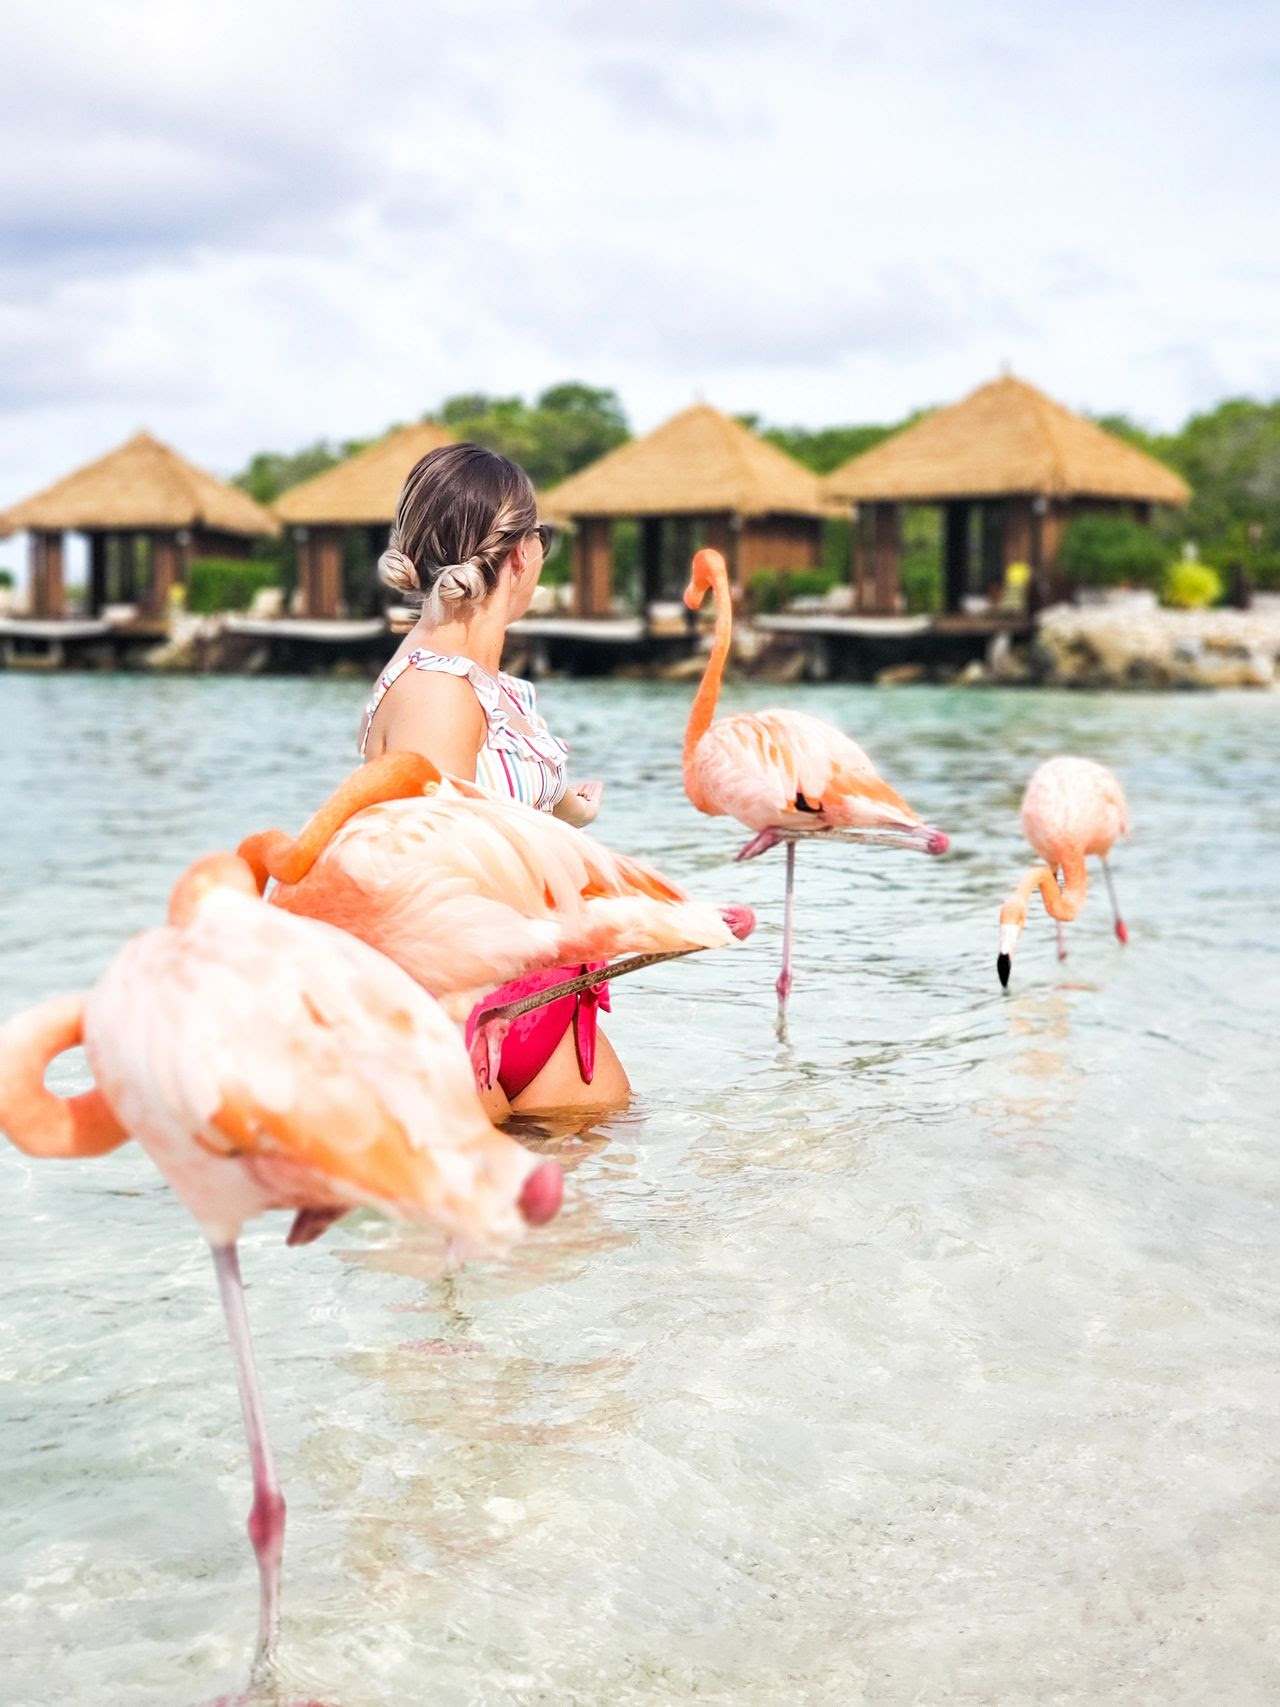 Renaissance Island Cabanas